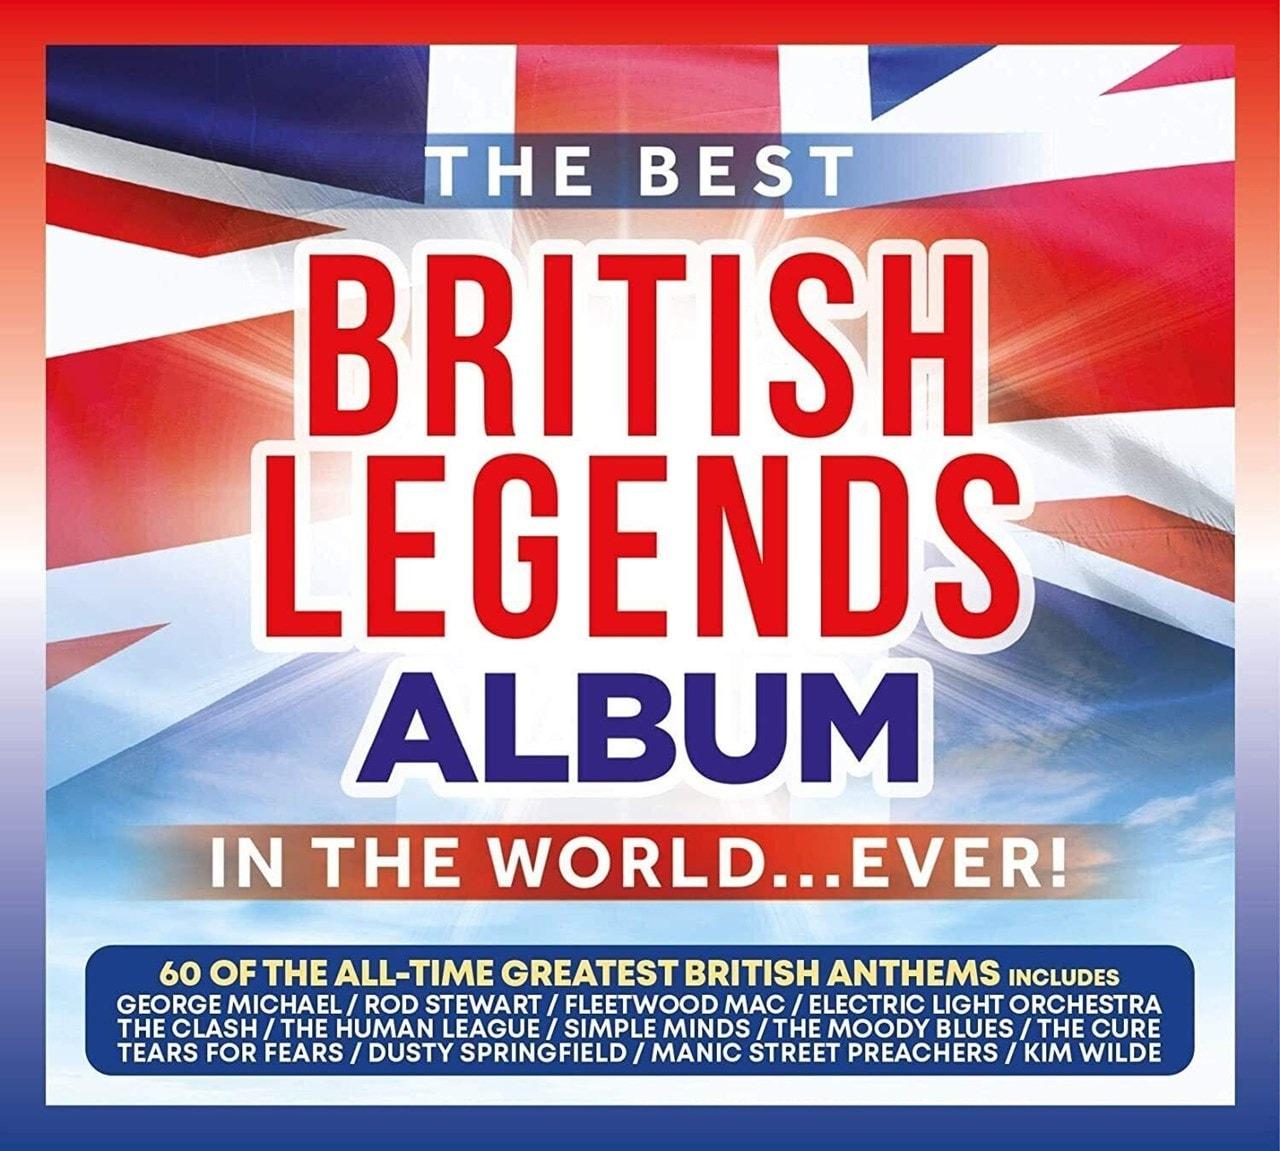 The Best British Legends Album in the World... Ever! - 1